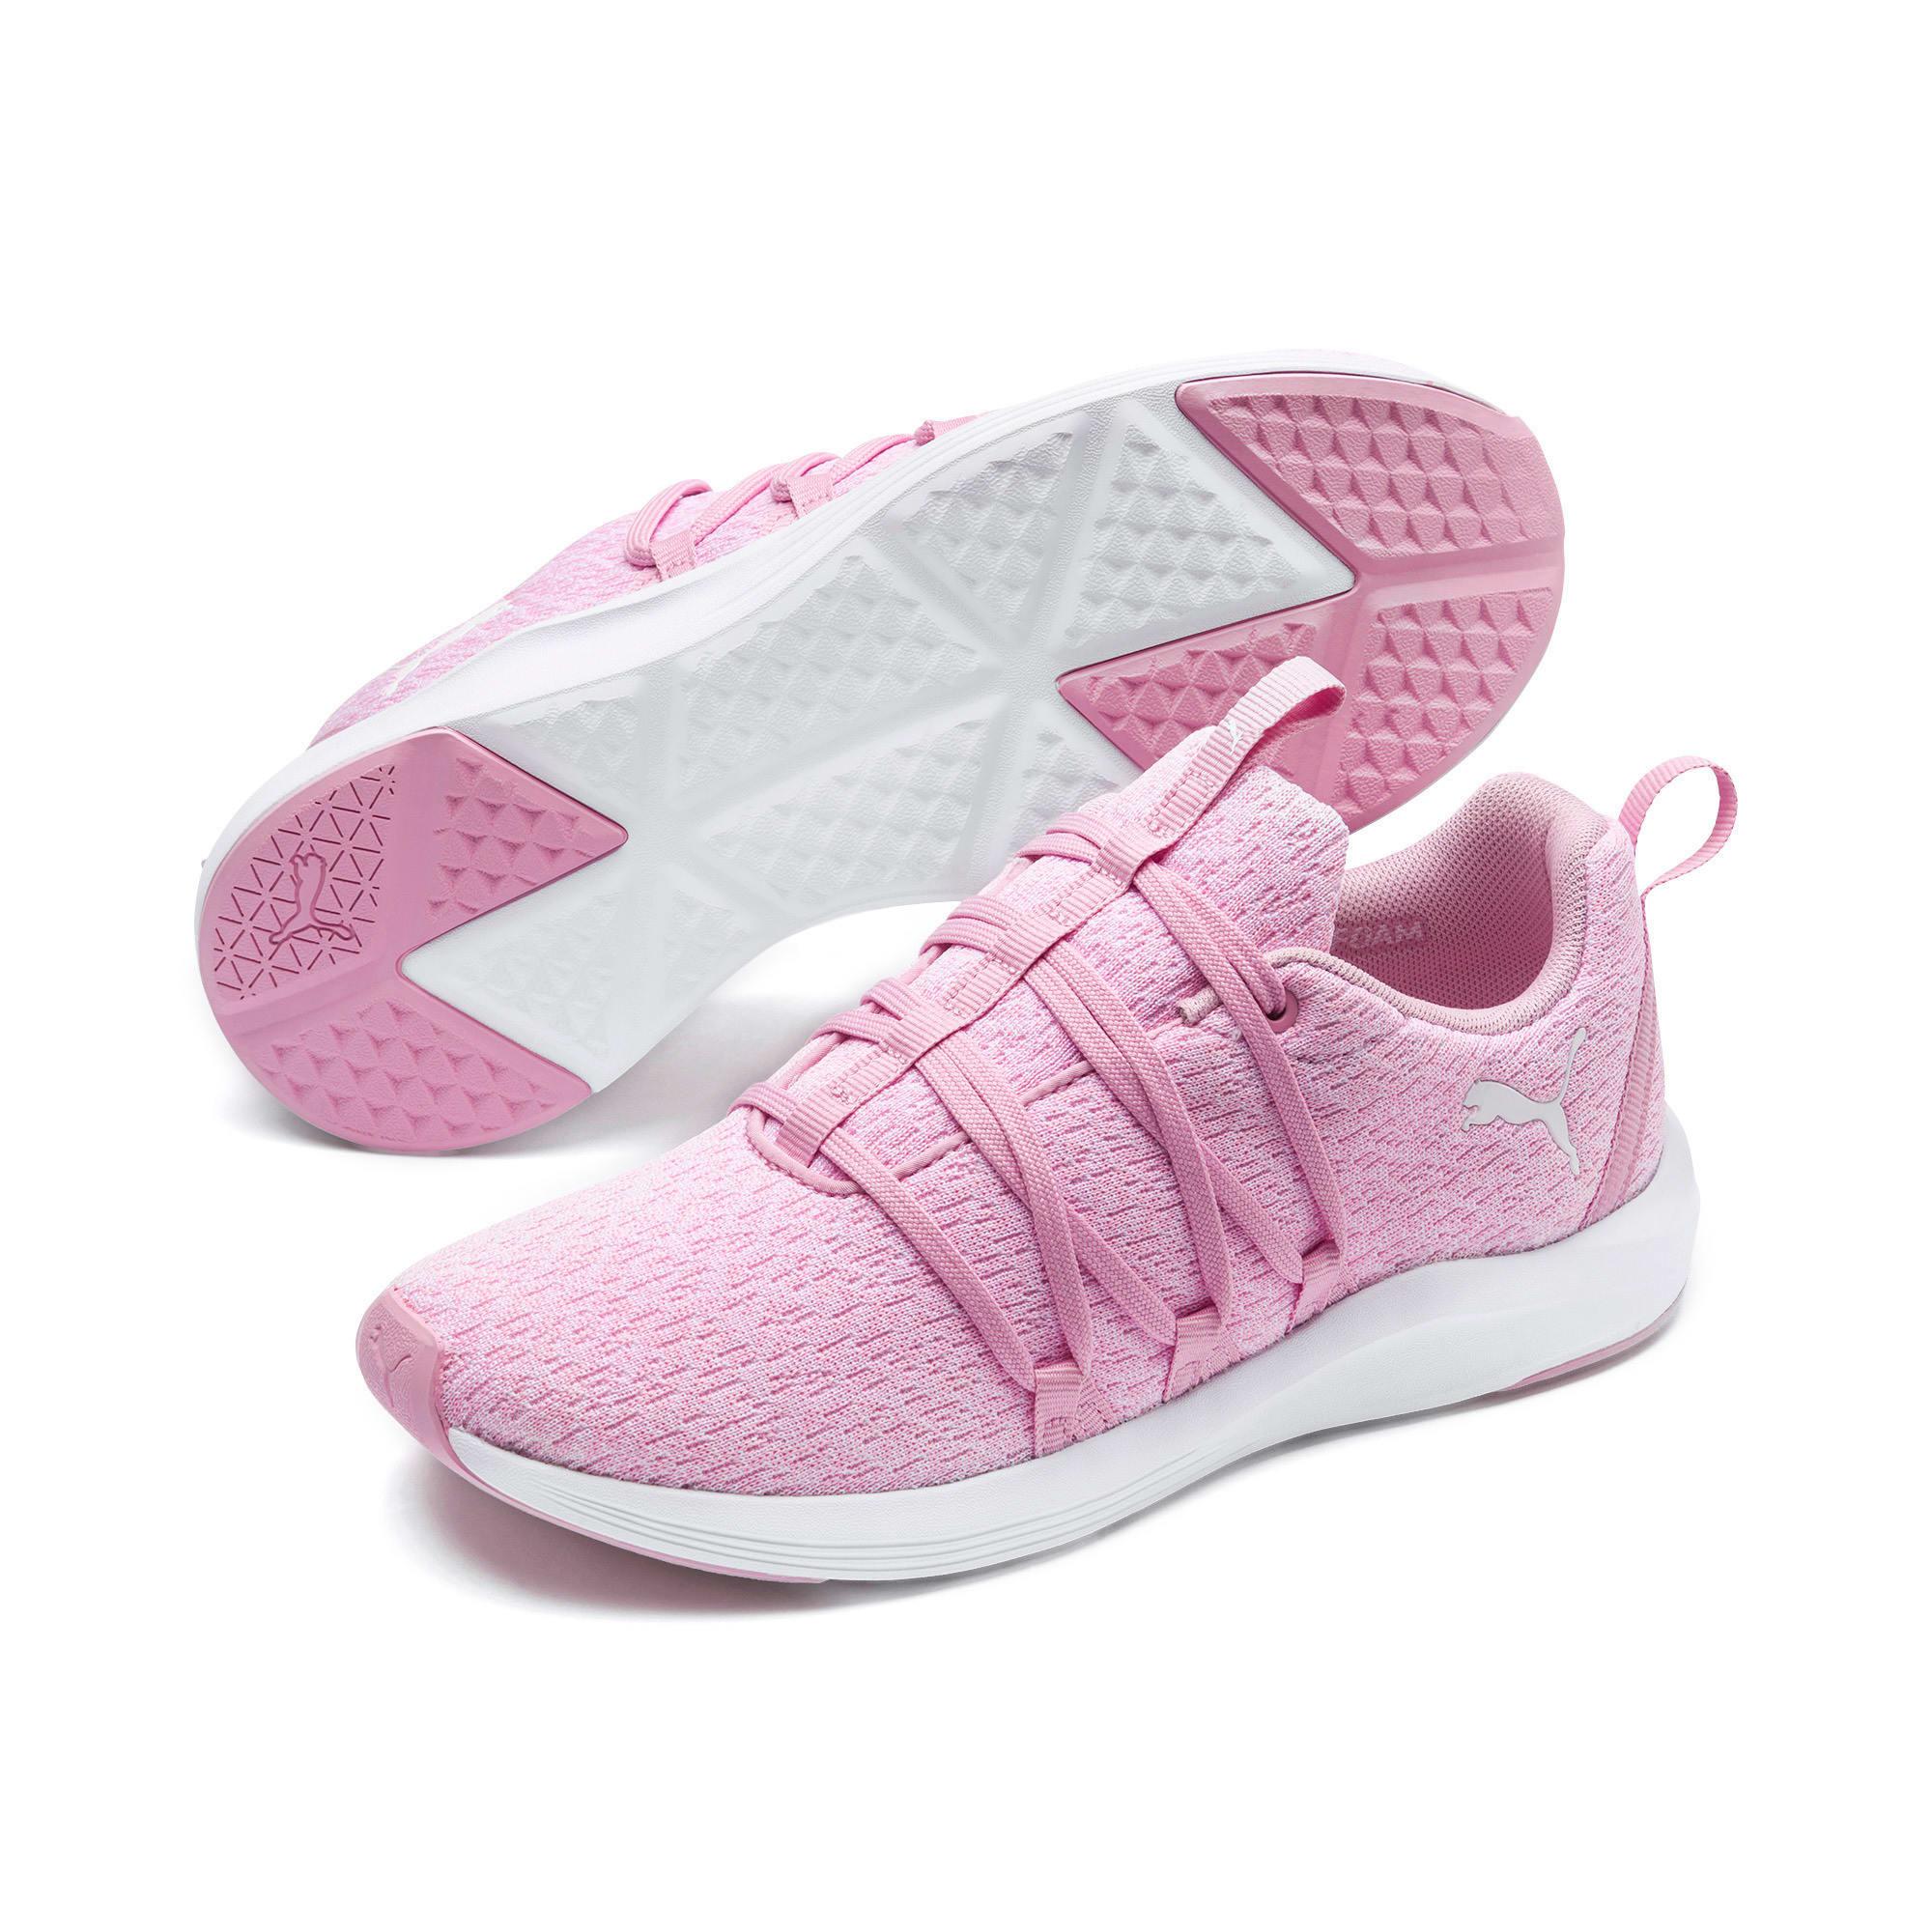 Thumbnail 2 of Prowl Alt Knit Women's Training Shoes, Pale Pink-Puma White, medium